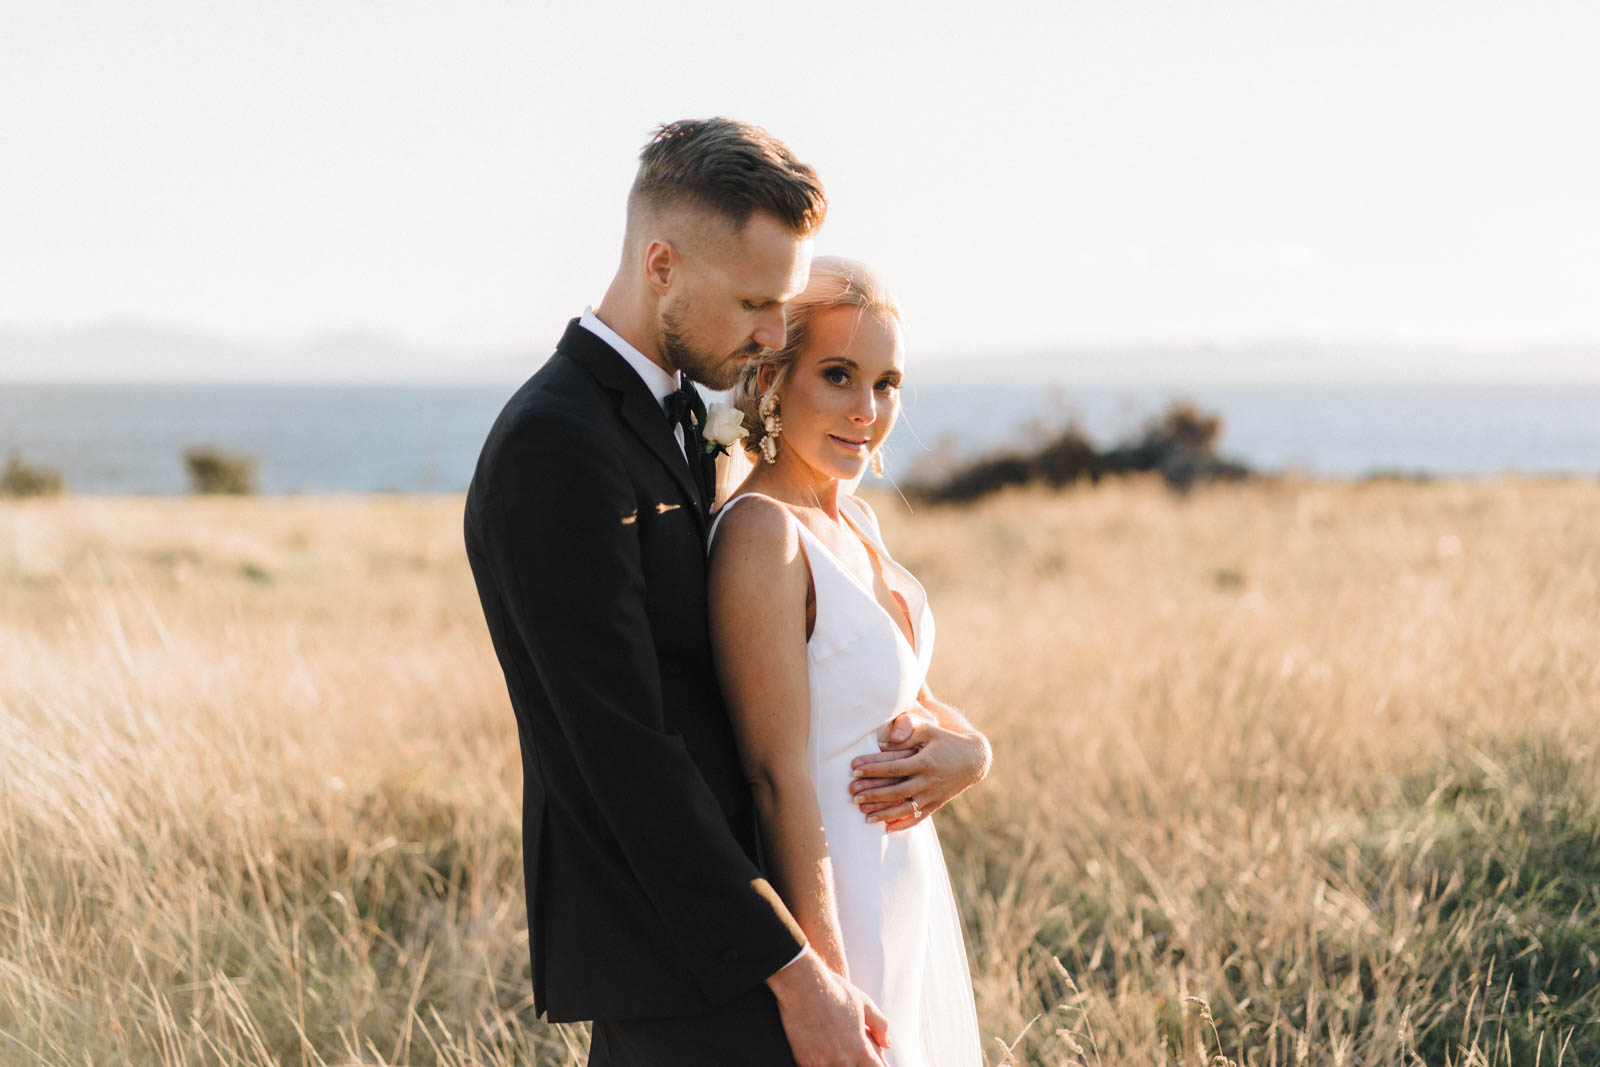 newfound-k-s-hilton-taupo-wedding-photographer-067